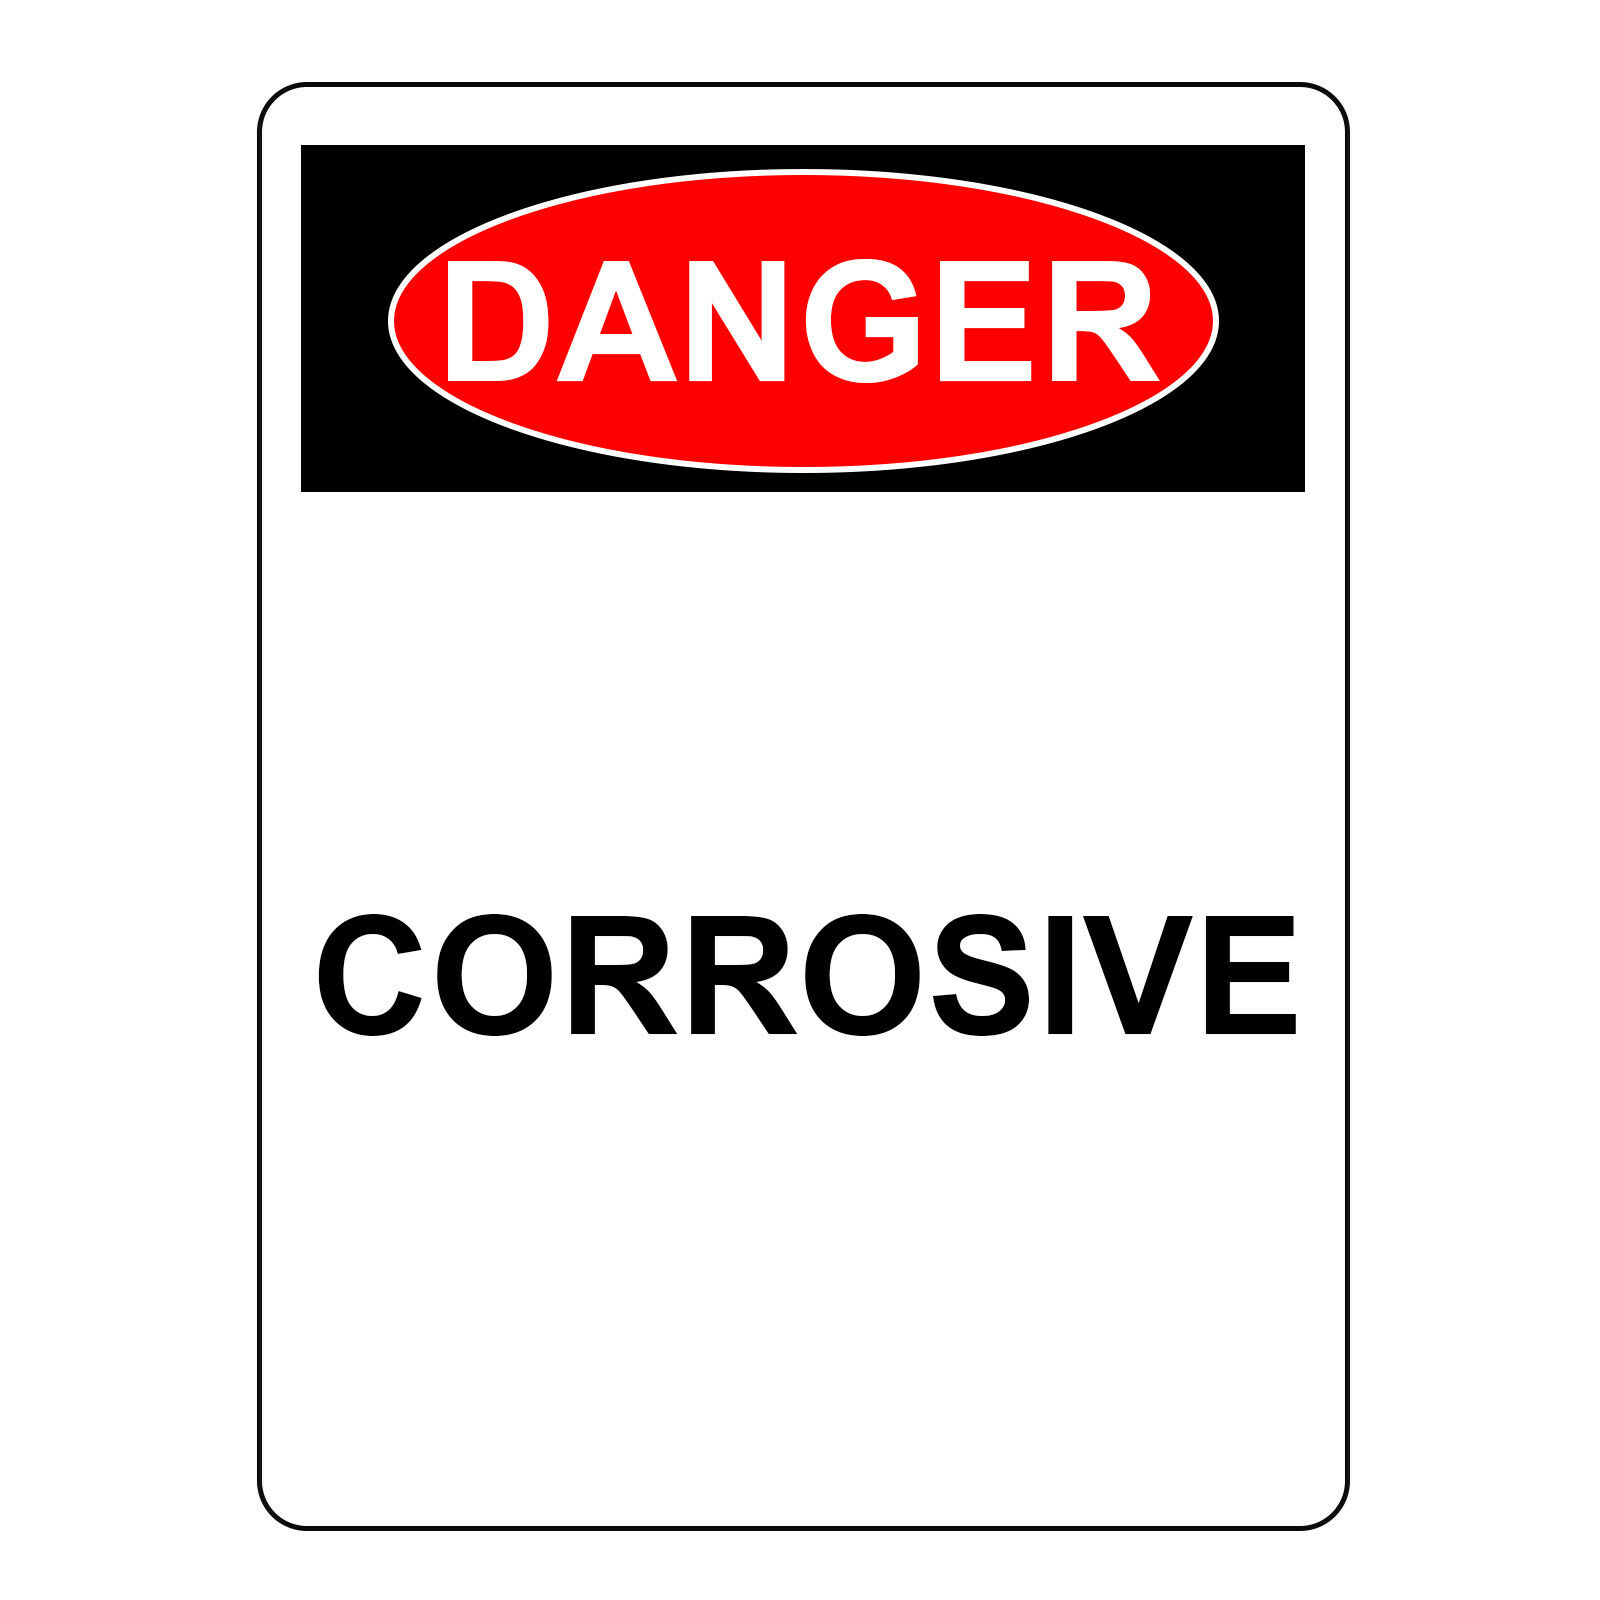 Danger Corrosive Sign, Aluminum Metal Hazard Safety Warning UV Print Signs